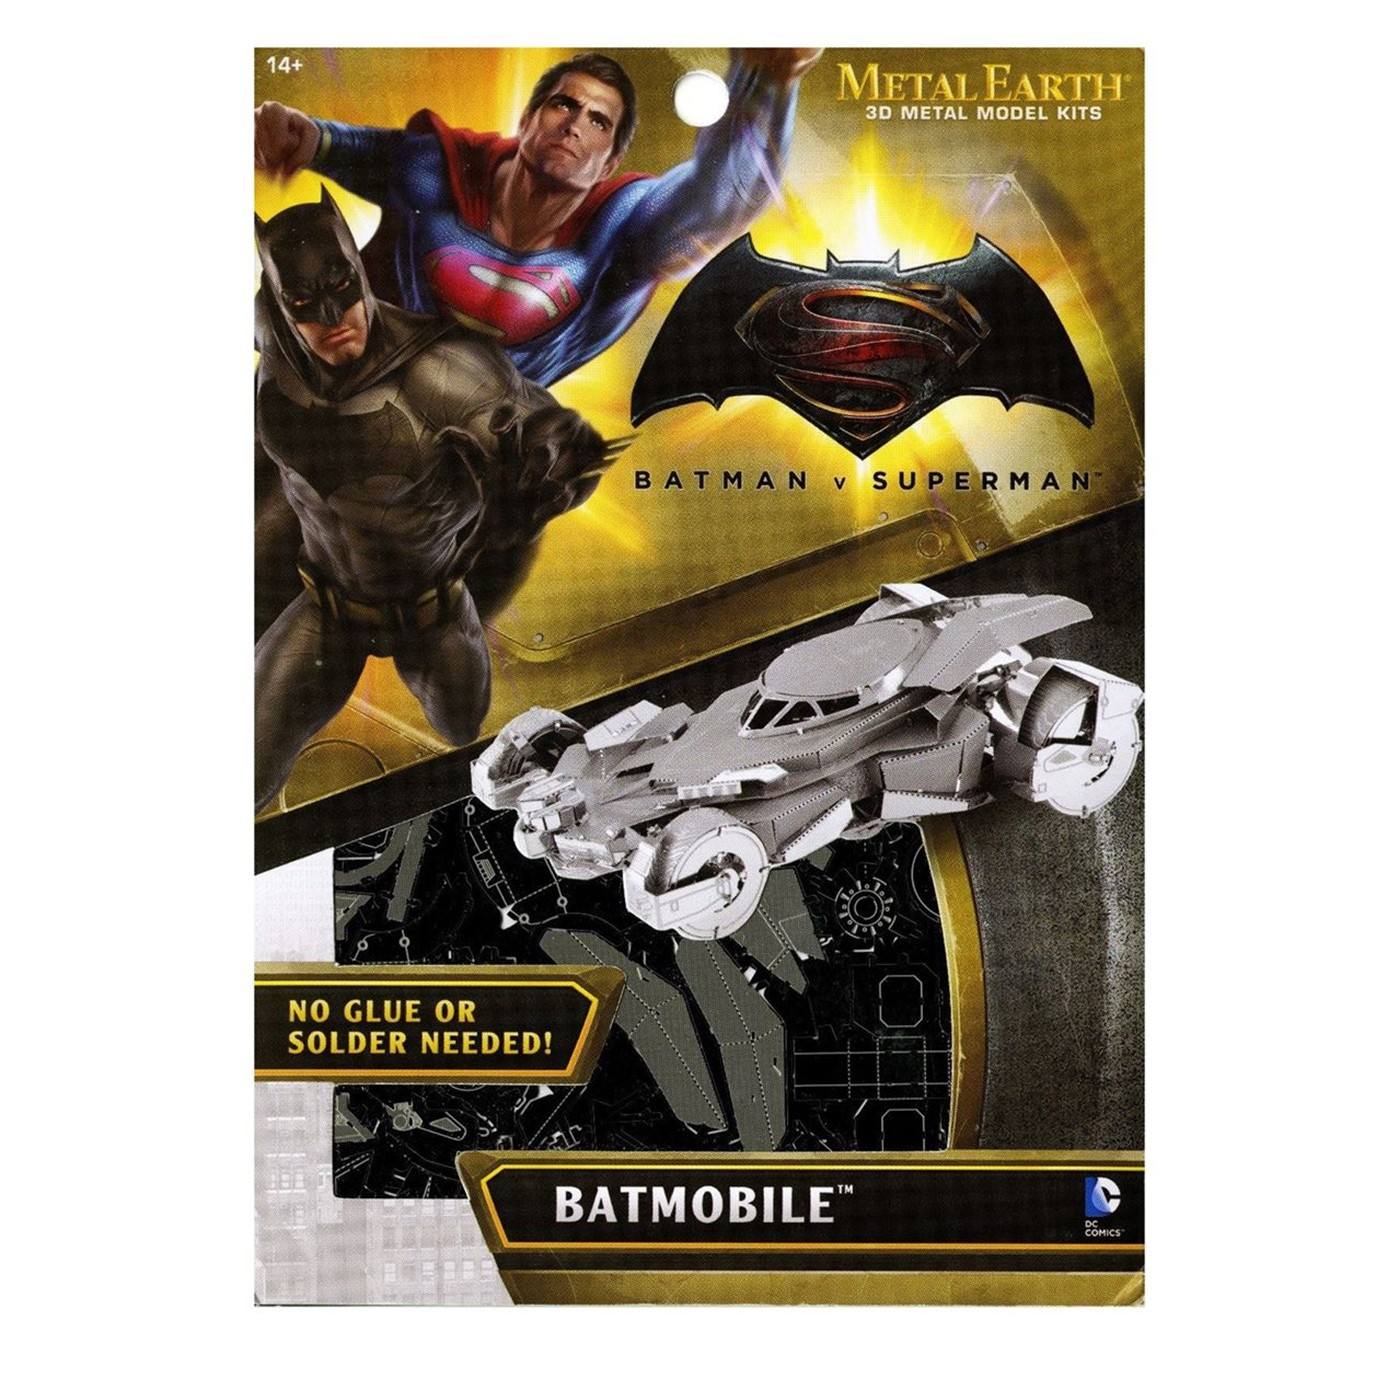 Batman Vs Superman Batmobile Metal Earth Model Kit